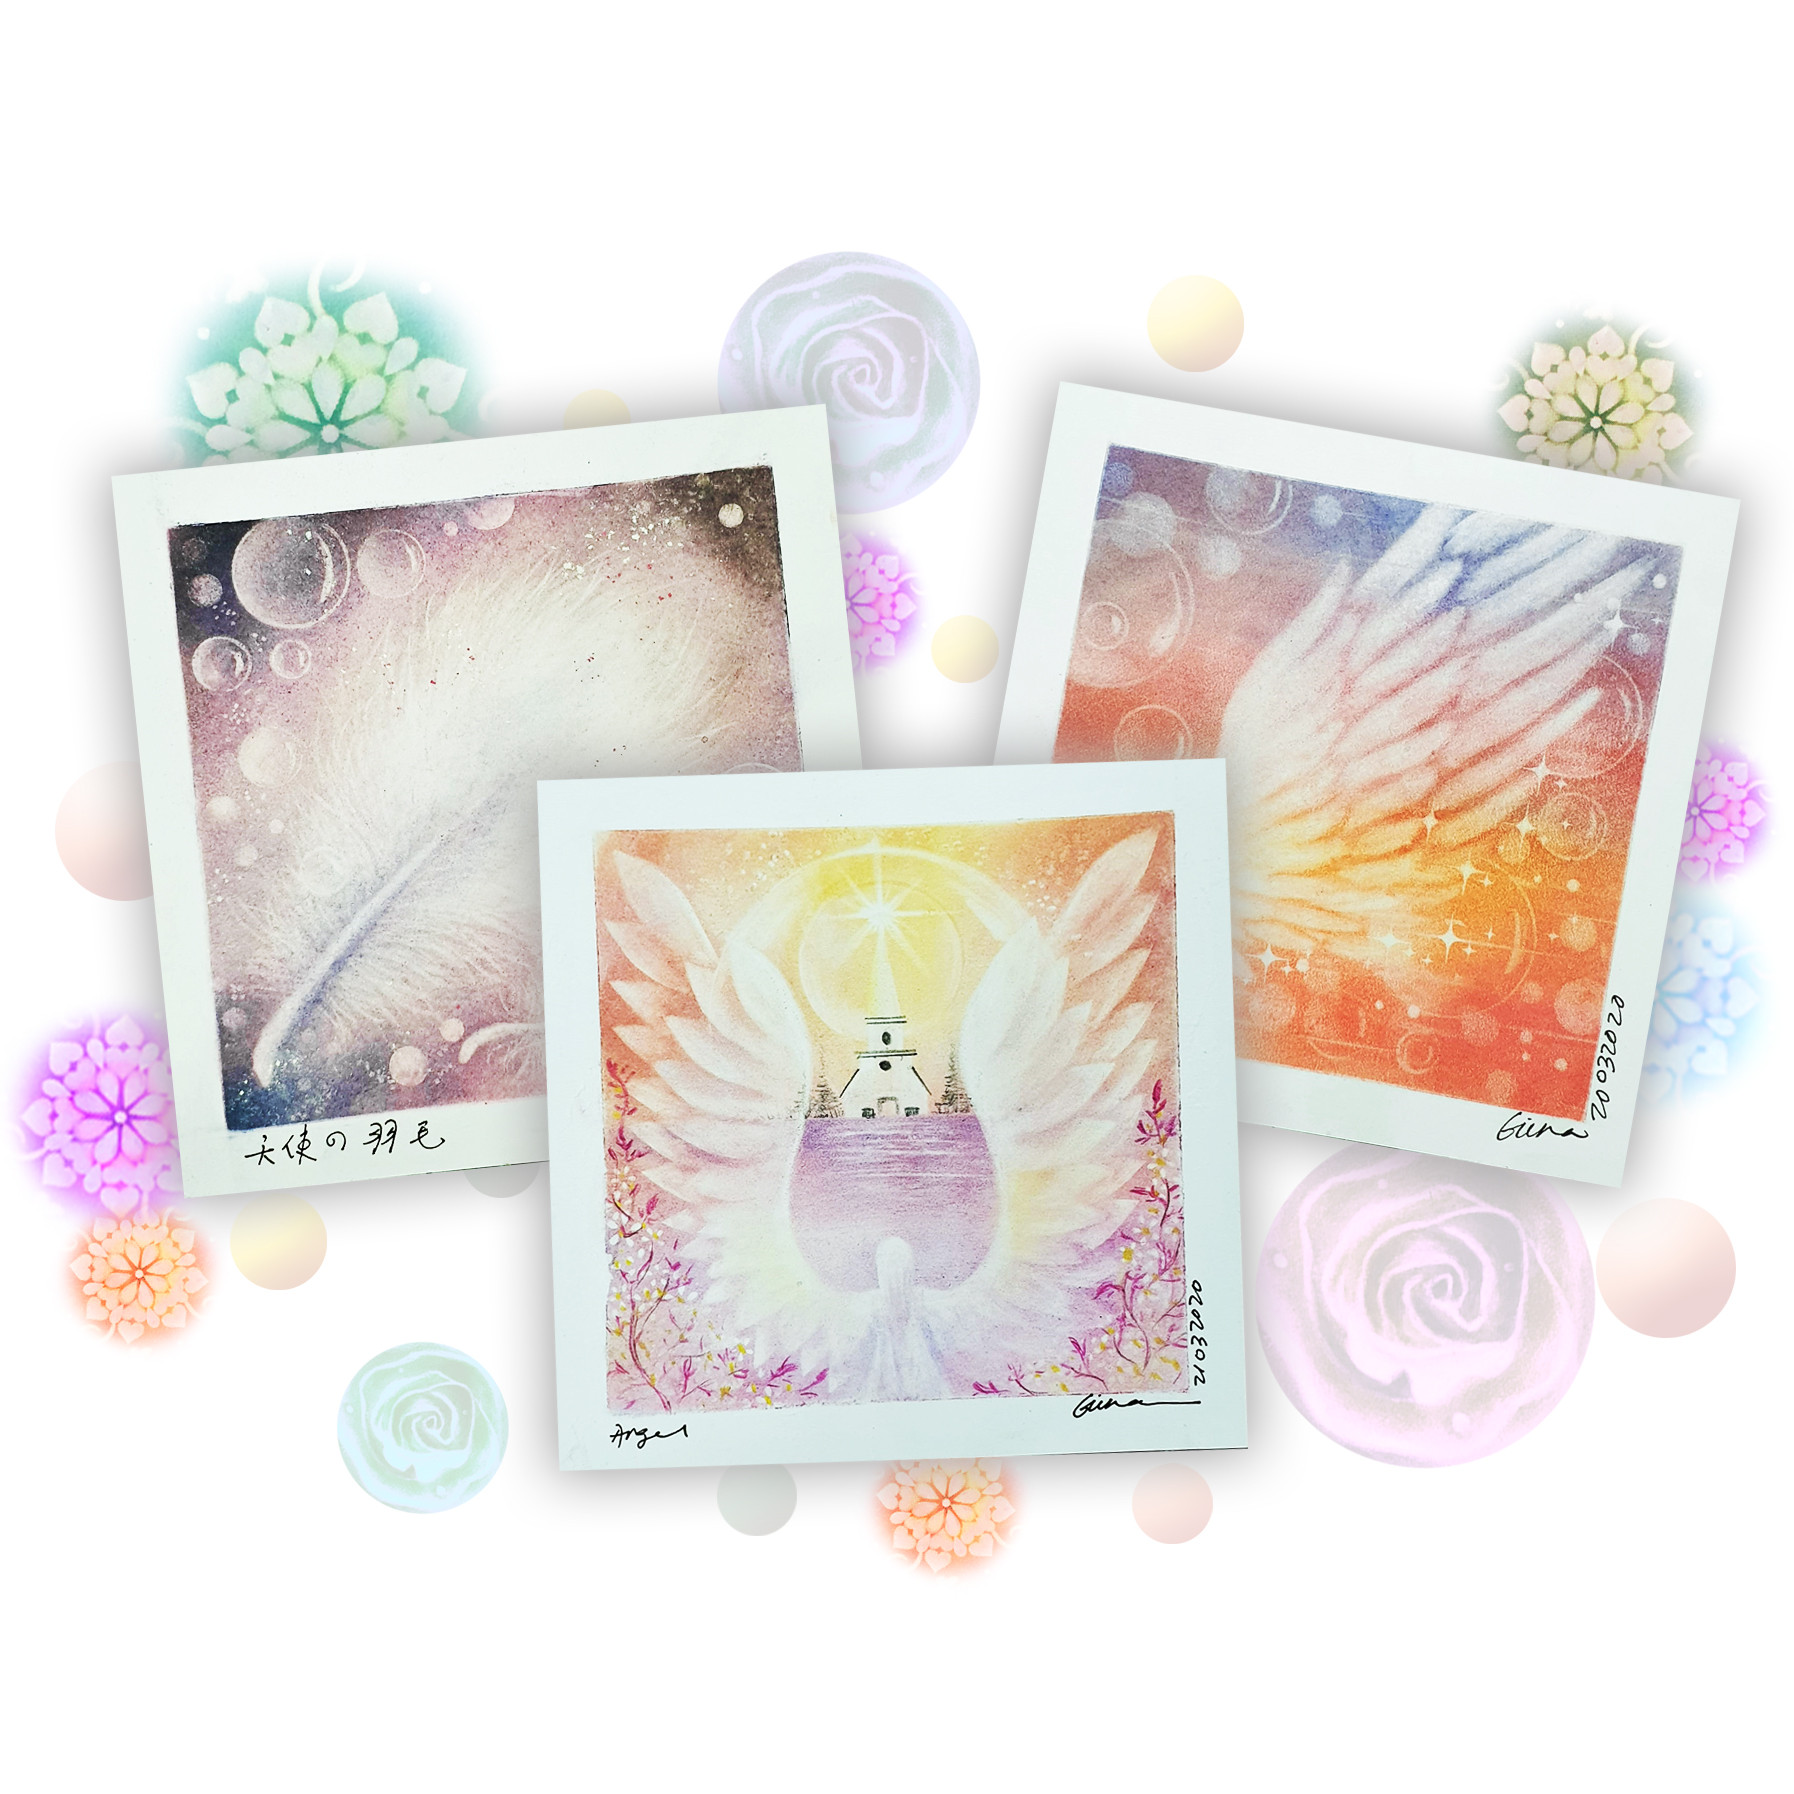 Part 1- Angel Blessing Pastel Art Course